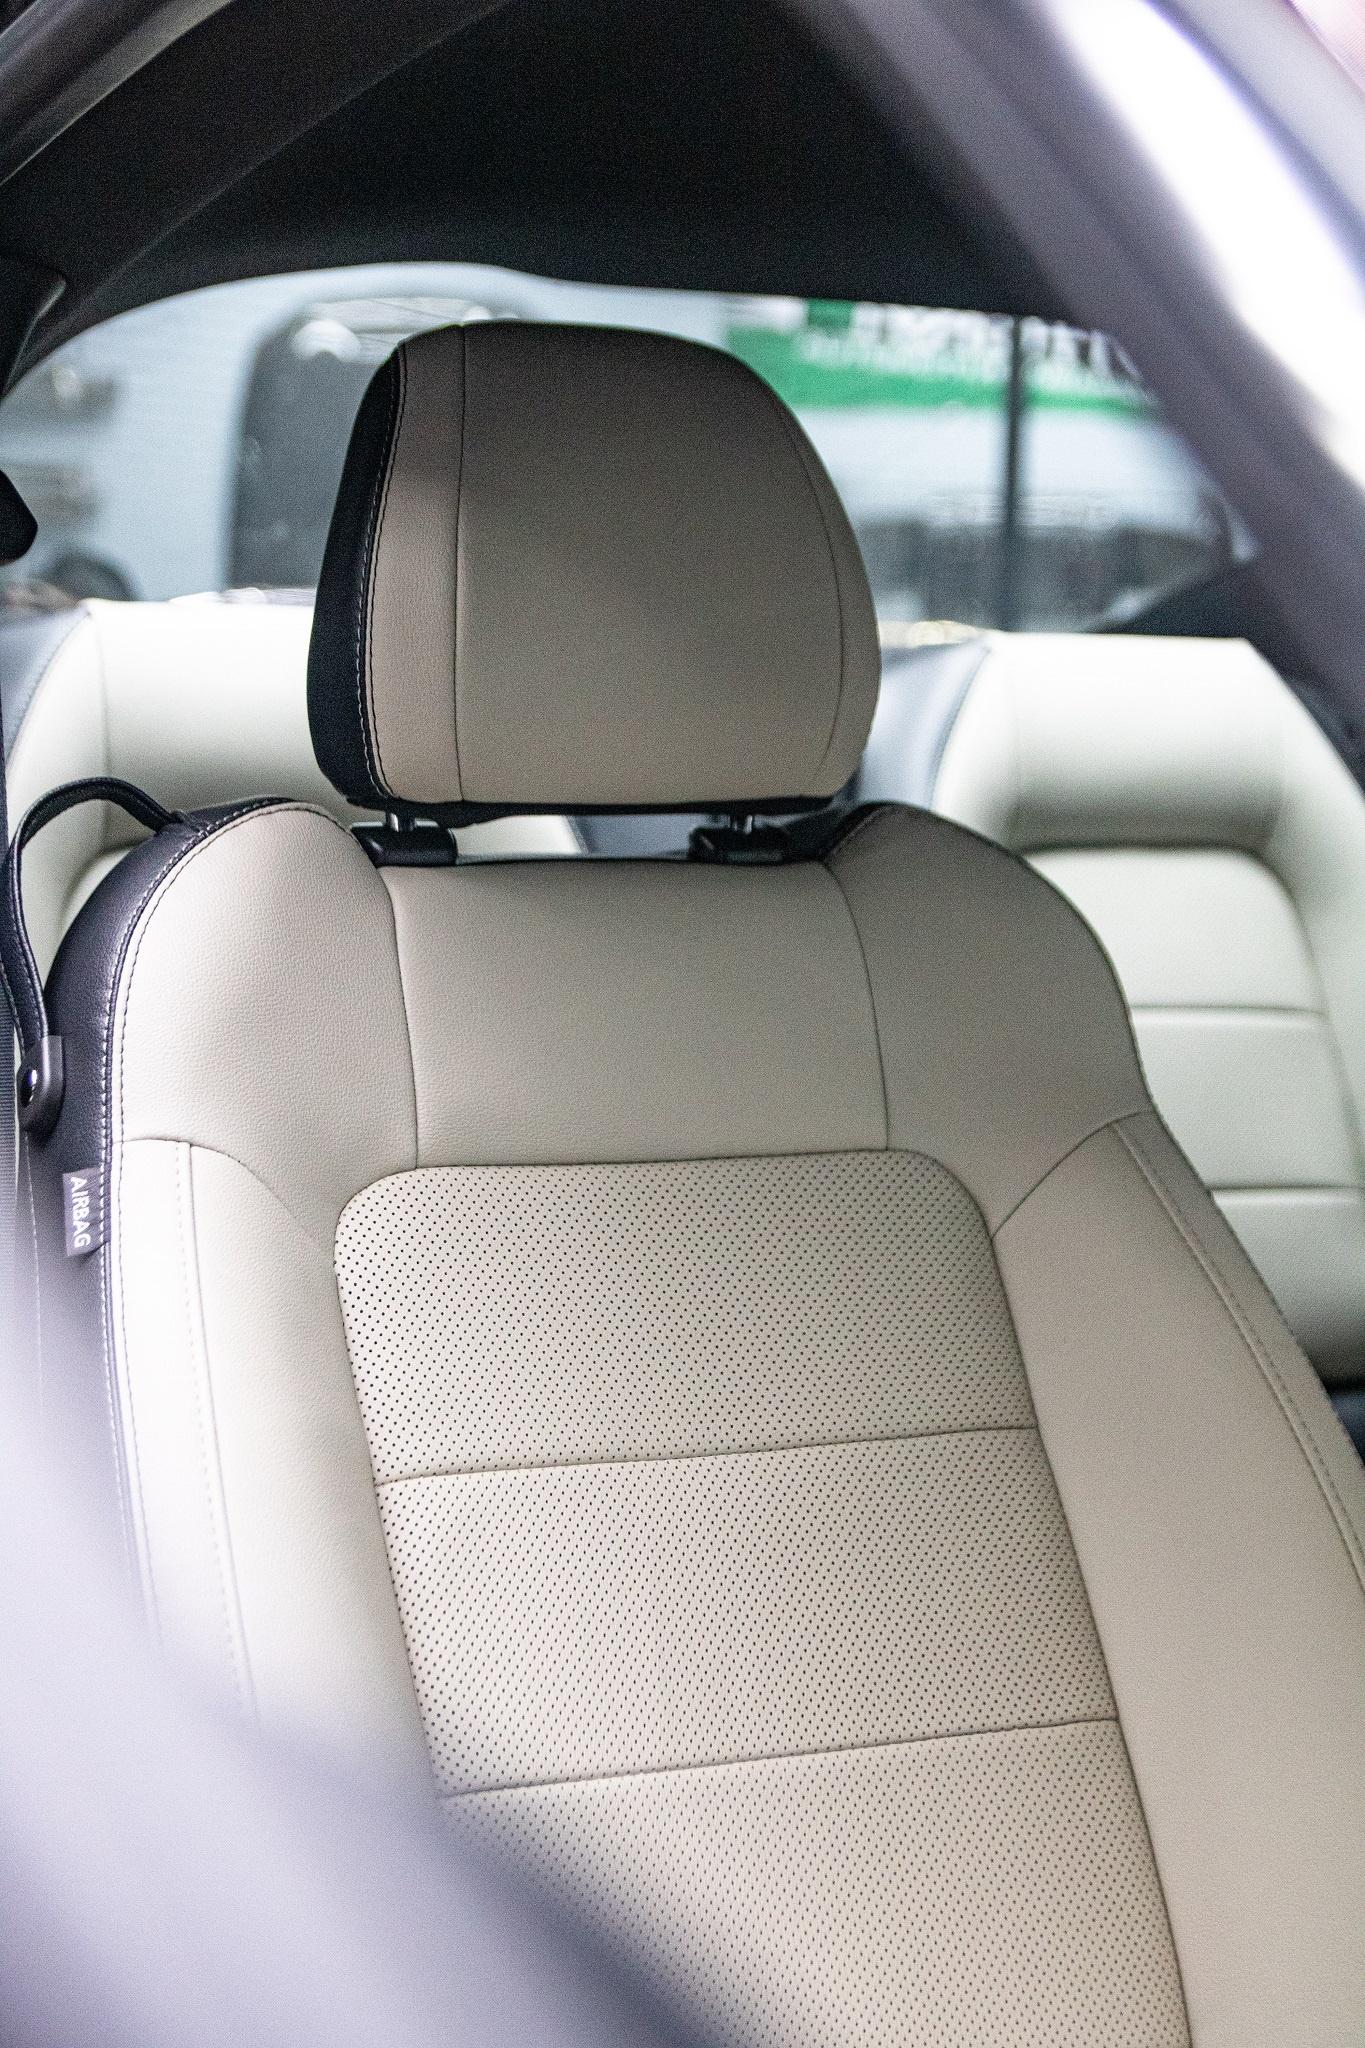 Ford Mustang 2020 phien ban ky niem vua ve VN, gia hon 3 ty hinh anh 30 Mustang_55_edition_zing_75_.jpg